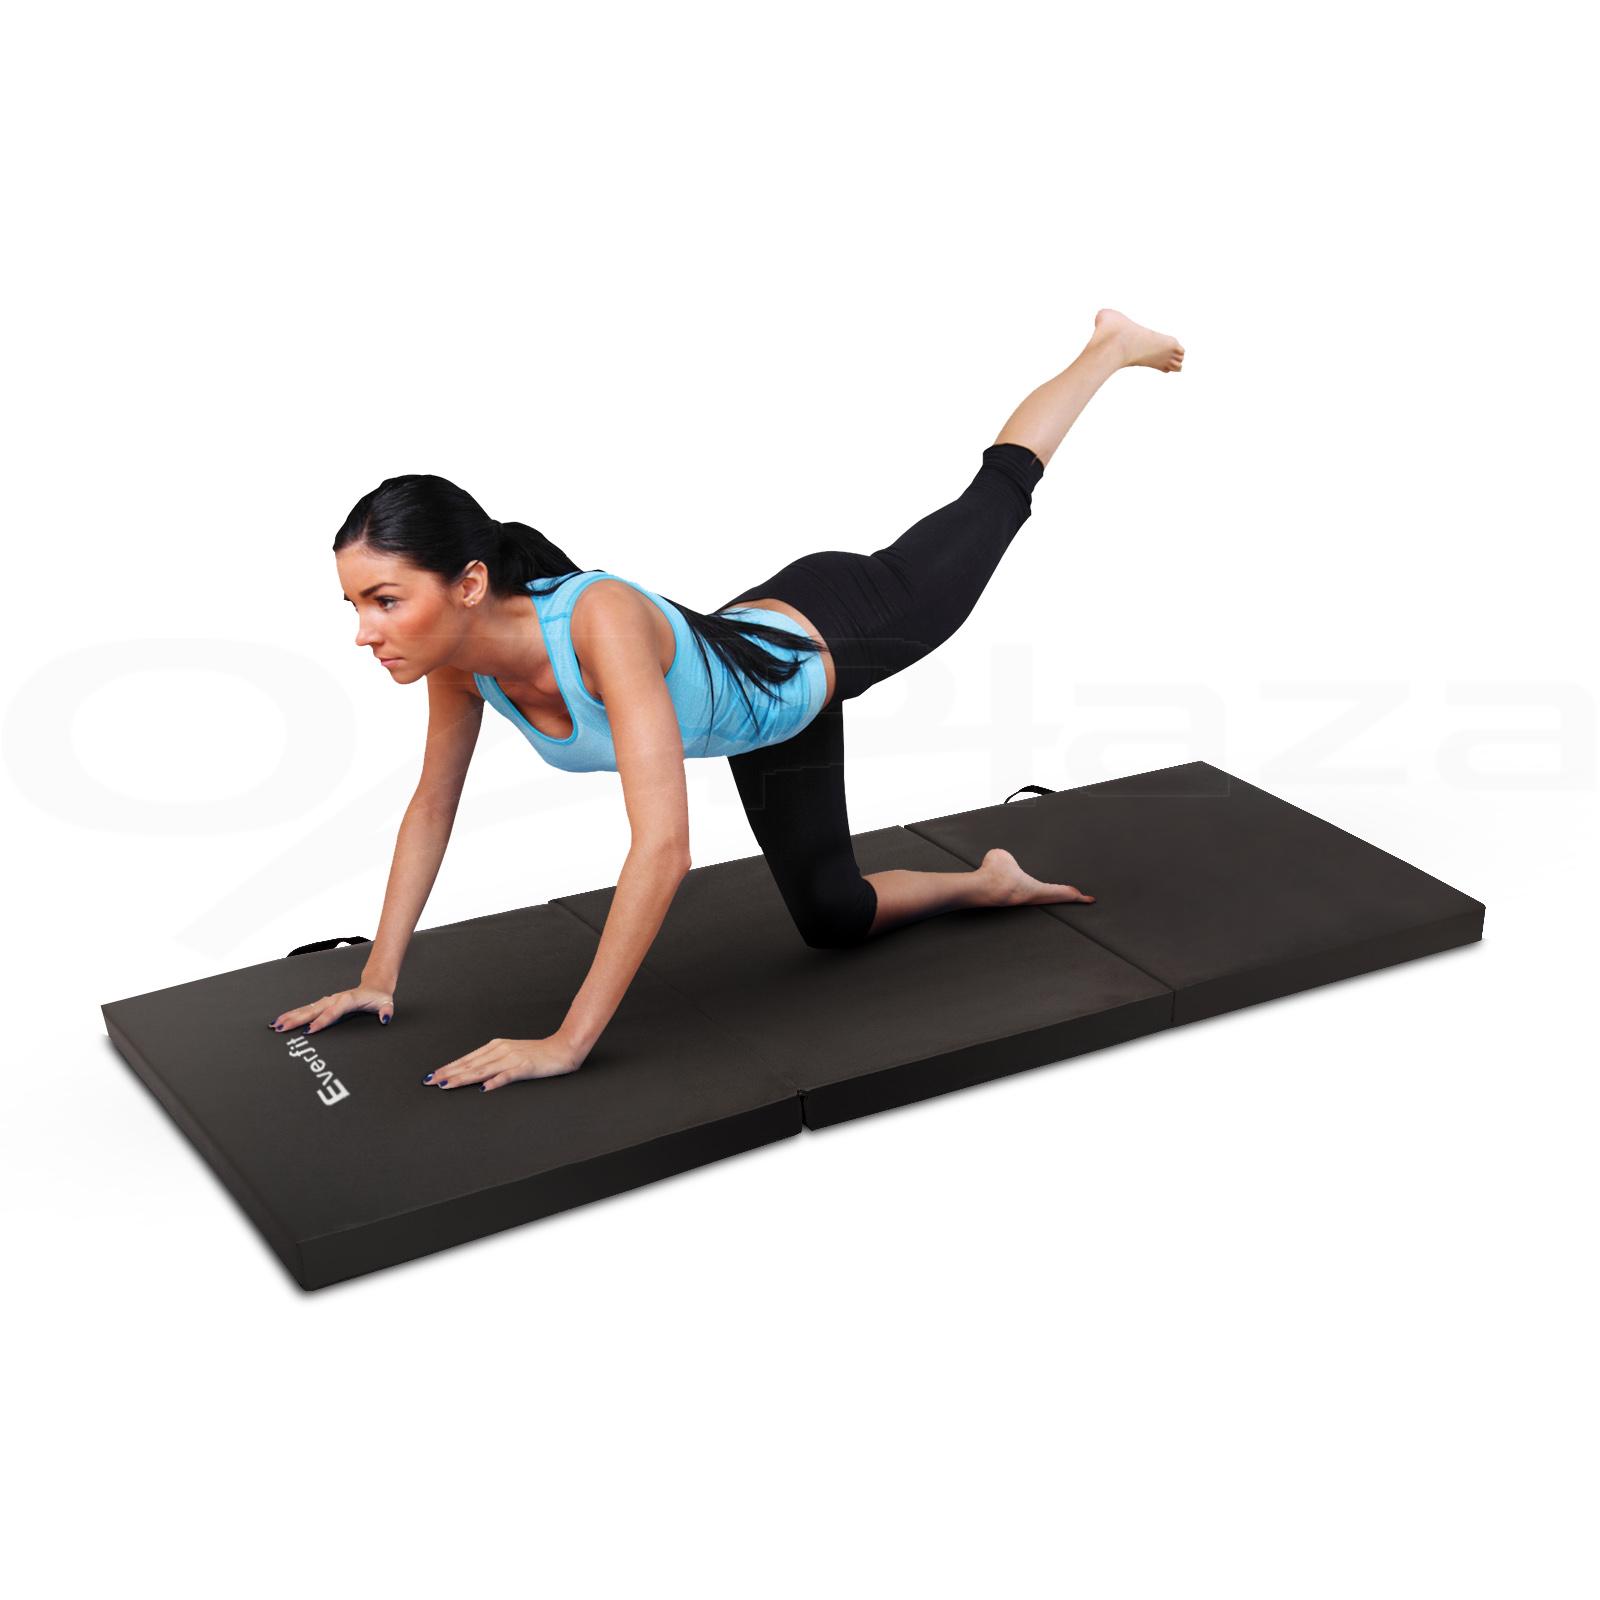 6CM Folding Exercise Mat Floor Dance YoGa Gymnastics